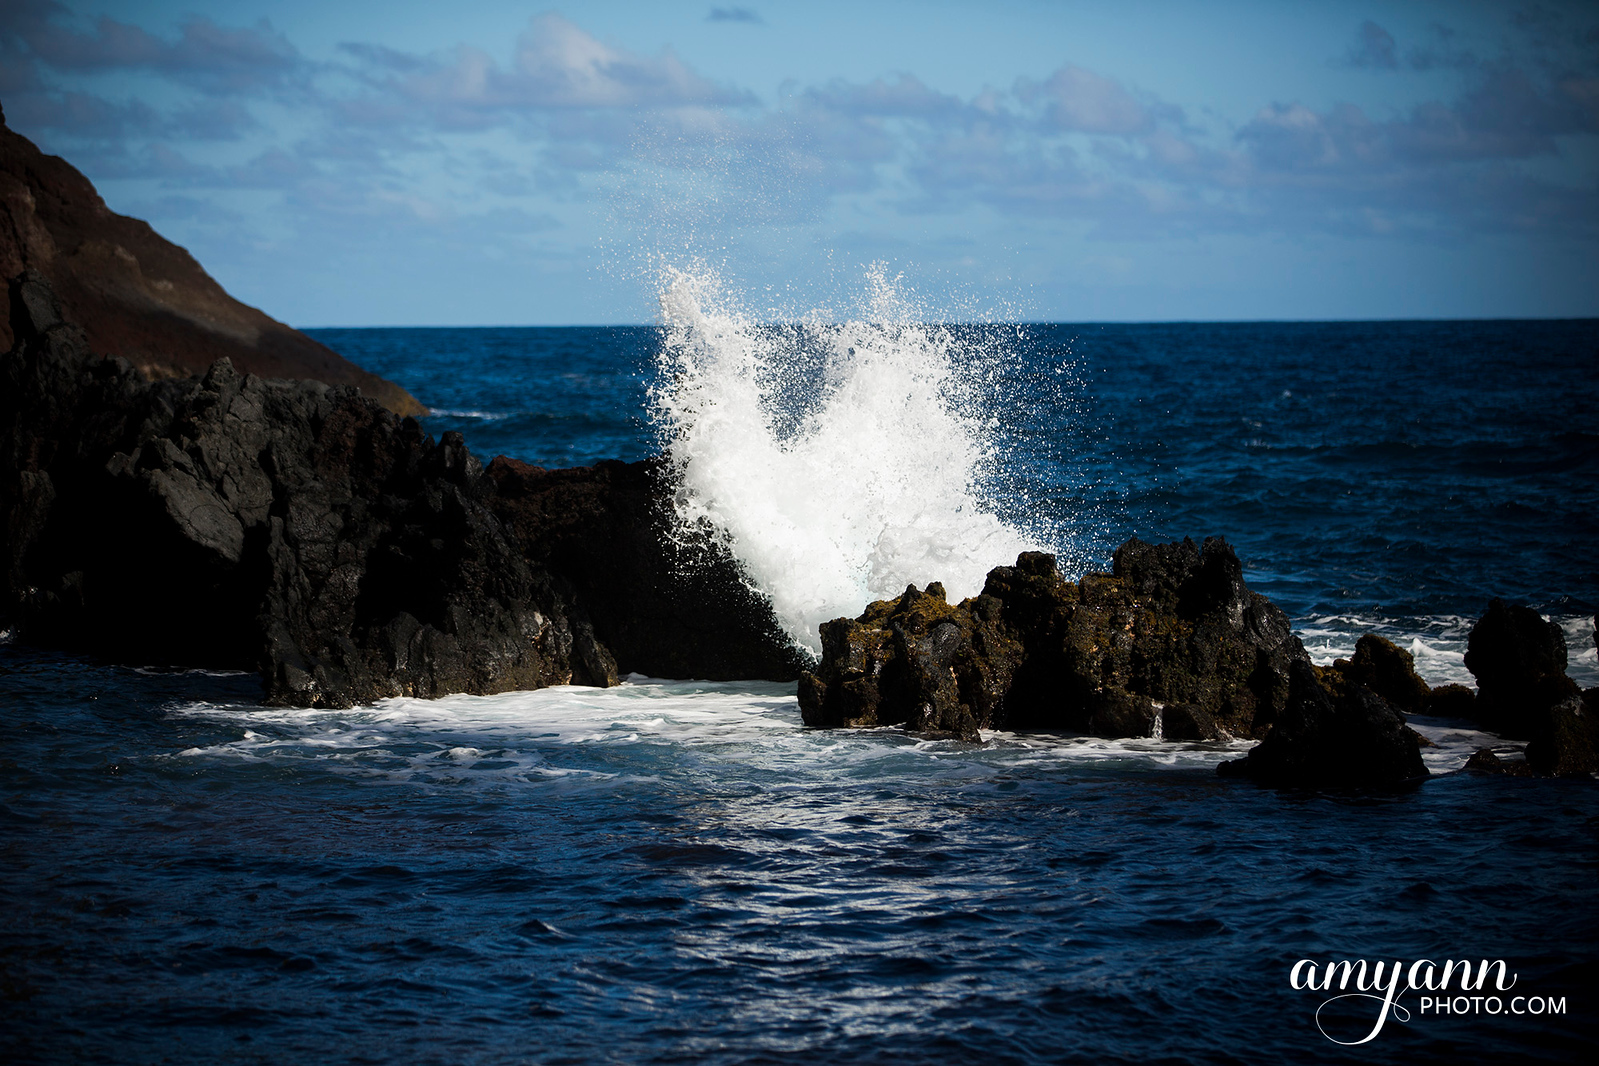 hawaii_amyannphoto_40